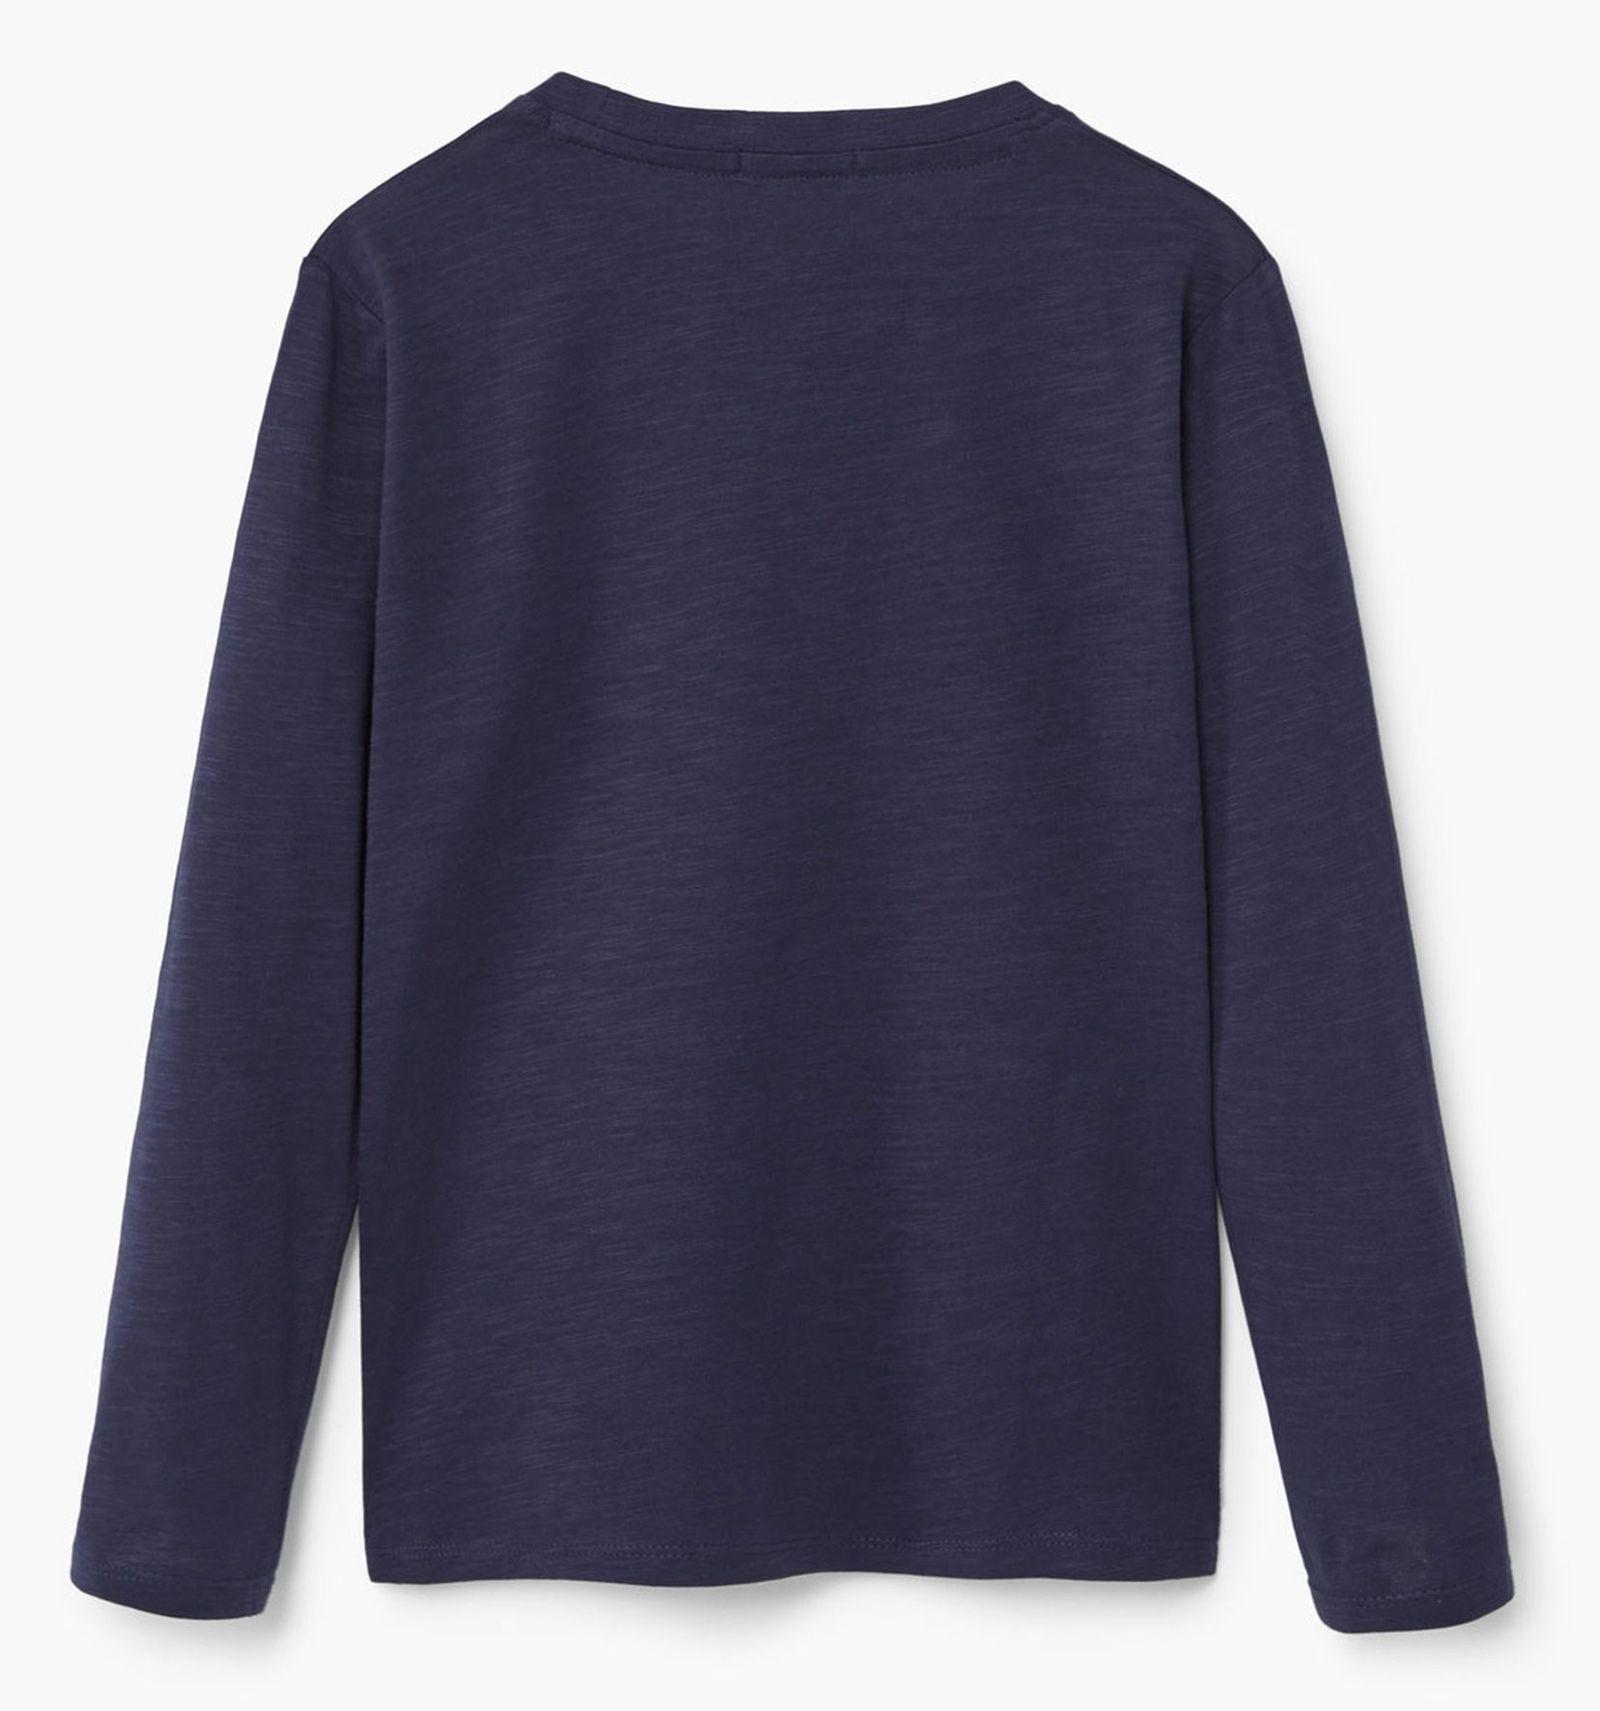 تی شرت نخی پسرانه - مانگو - سرمه اي - 2